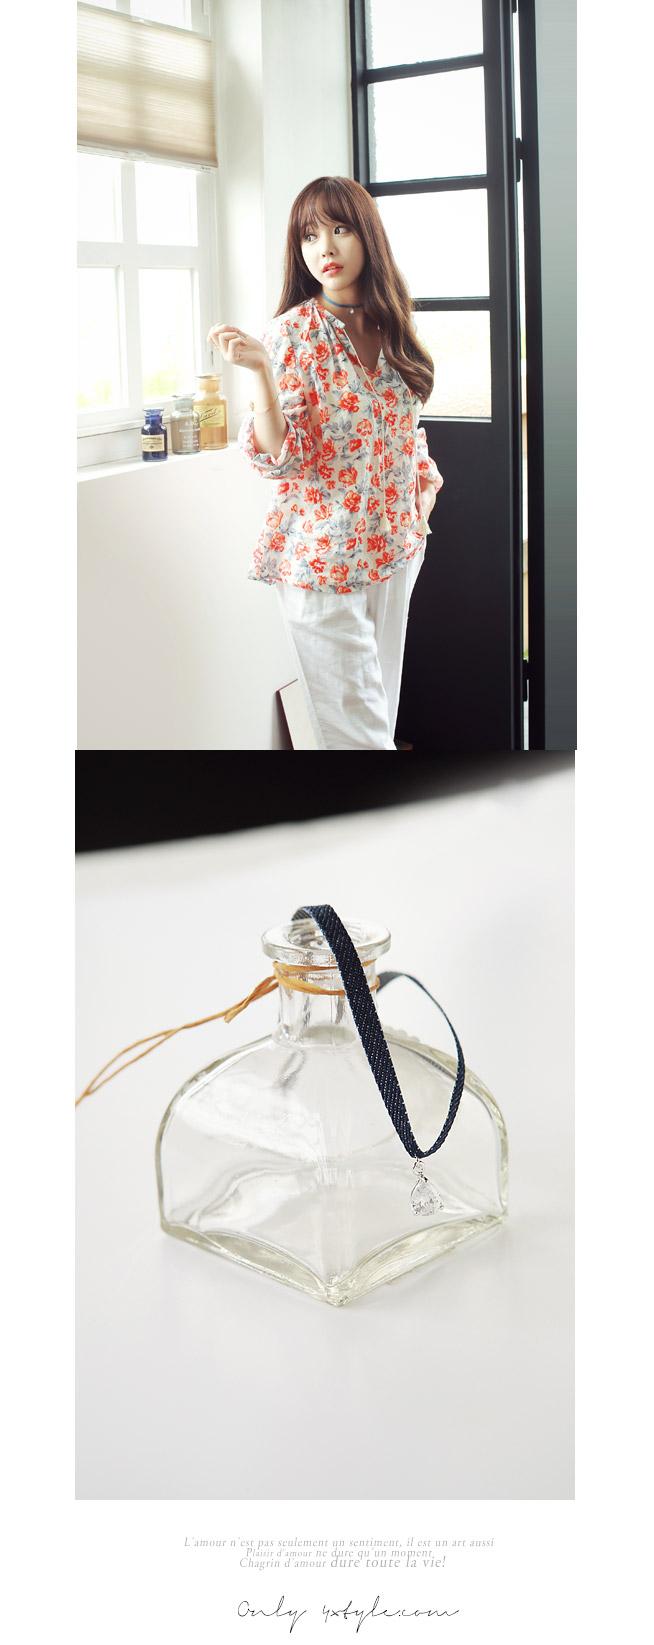 [ 4xtyle ] 牛仔布环项链,2色